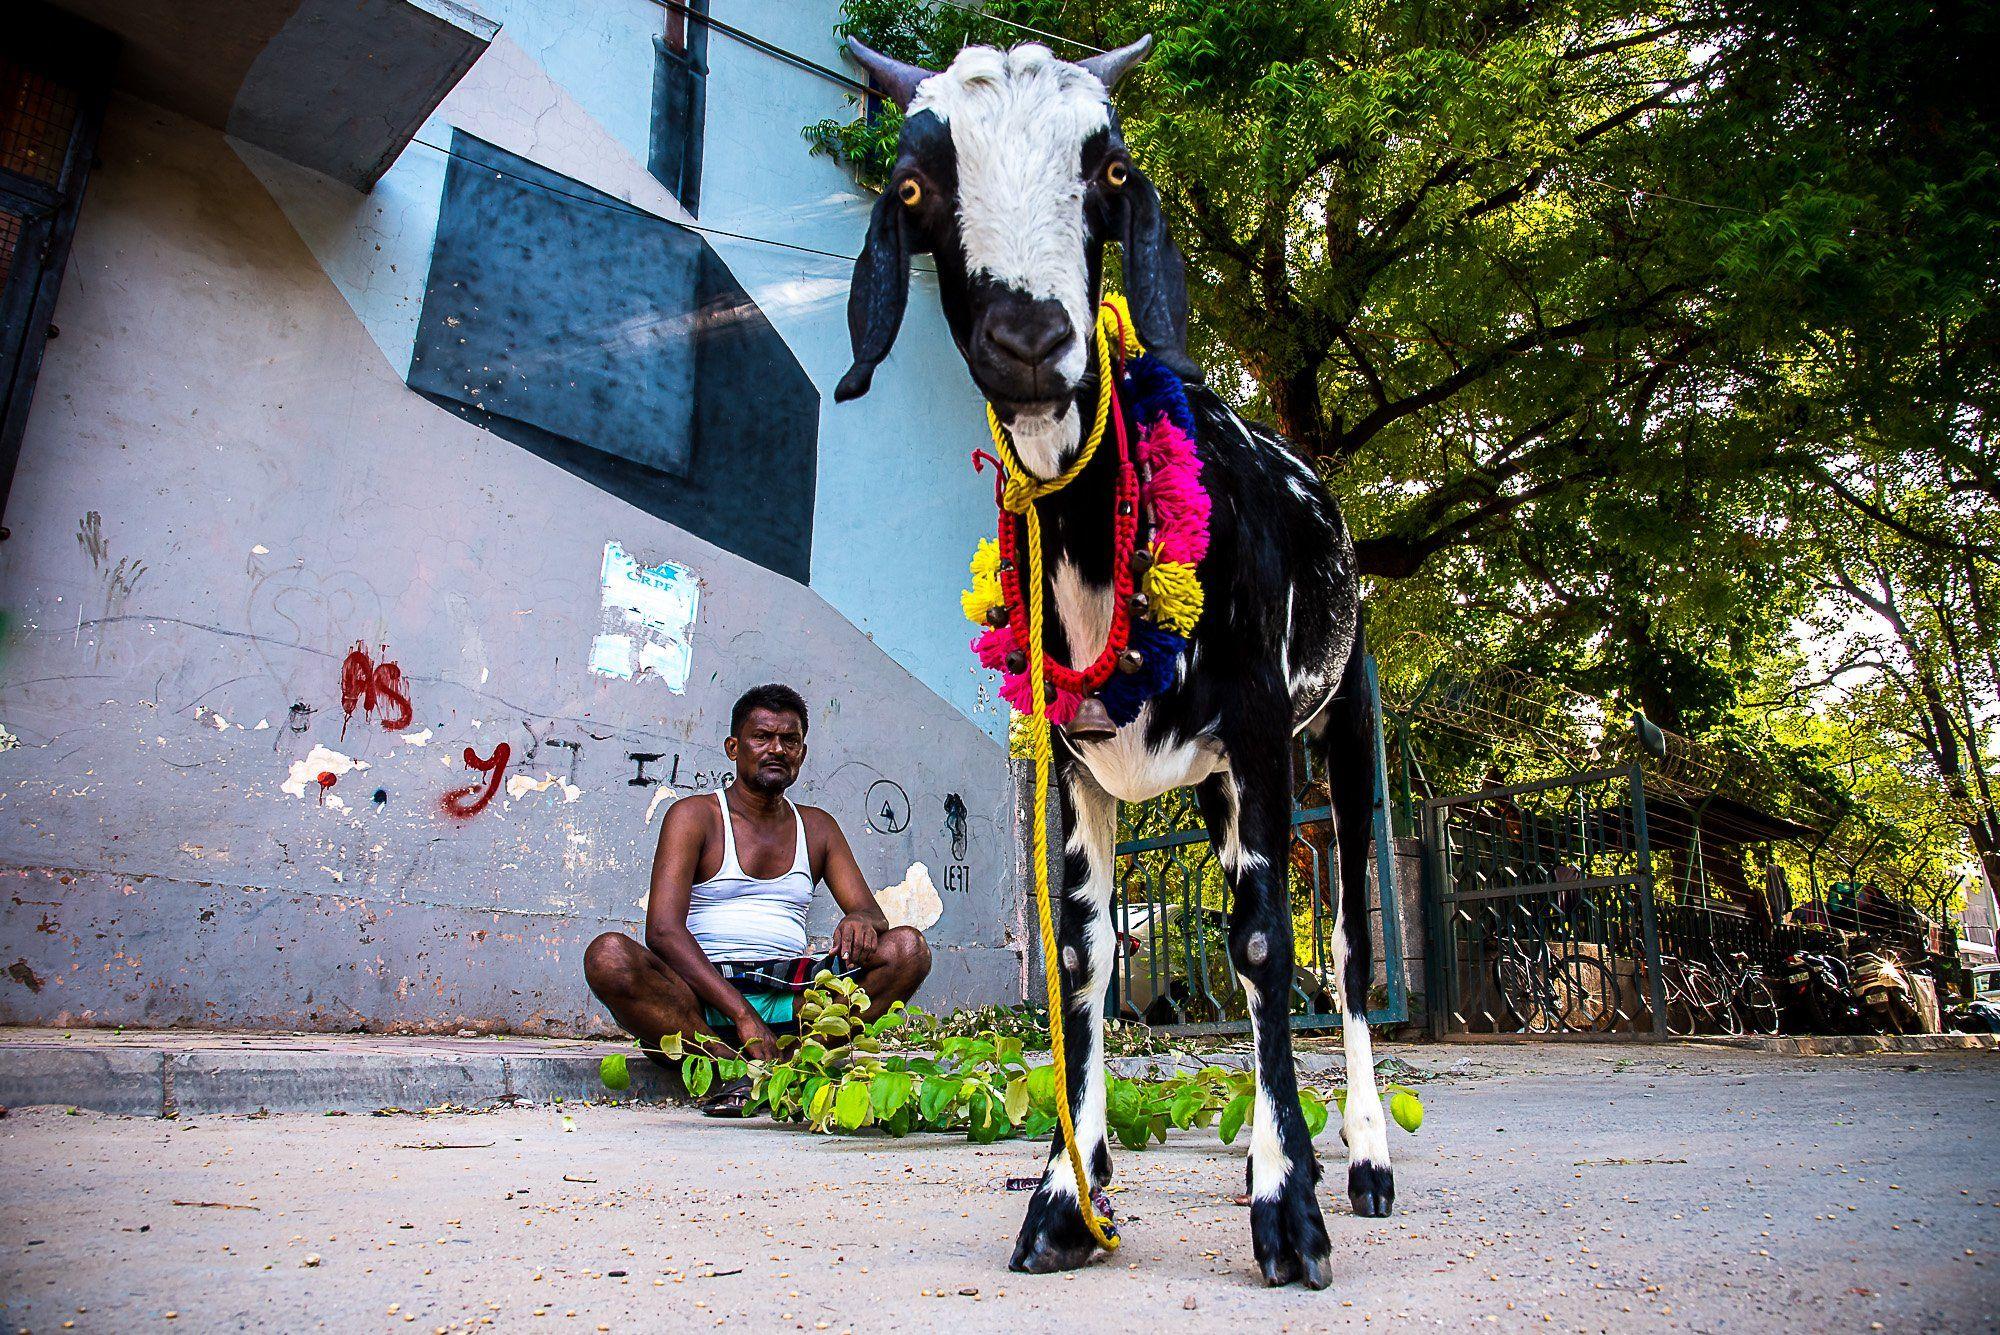 street photography goat frame city delhi , Chetan Verma